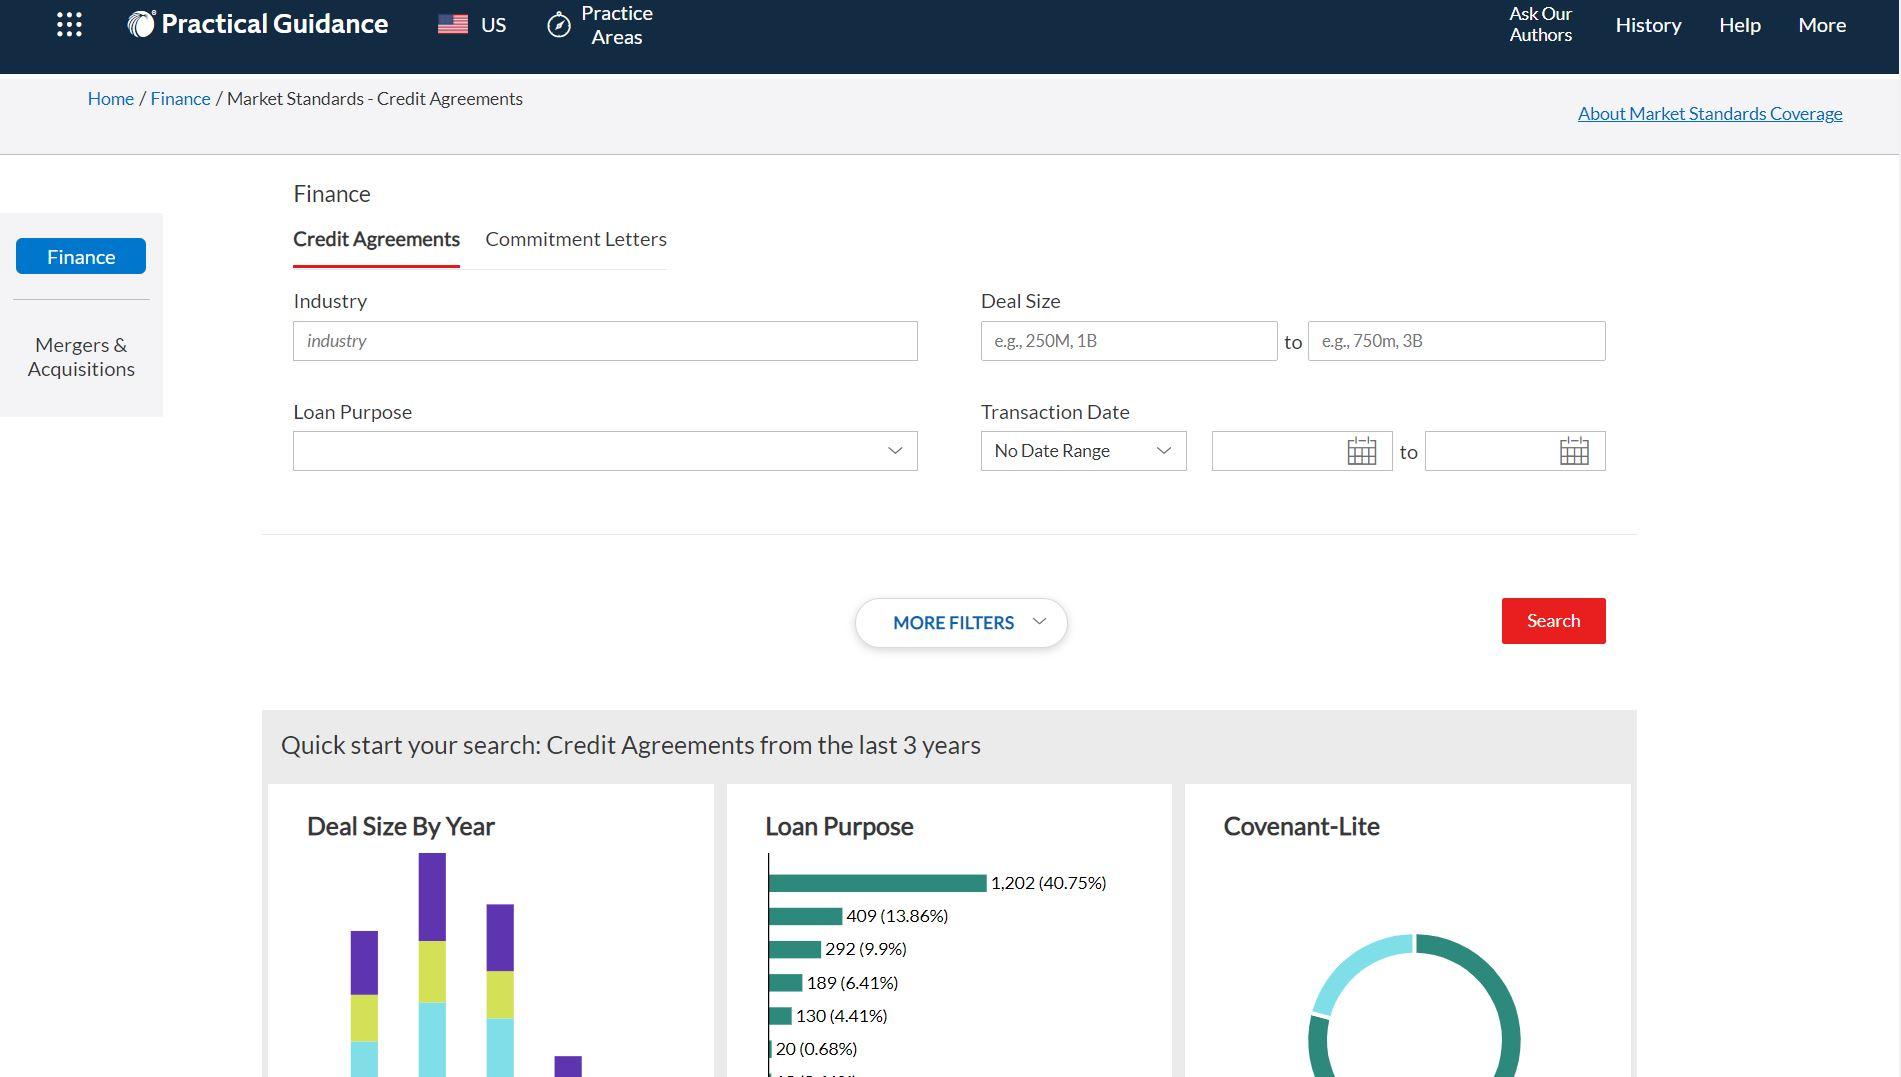 Market Standards - Finance Home Screen; image courtesy of LexisNexis.